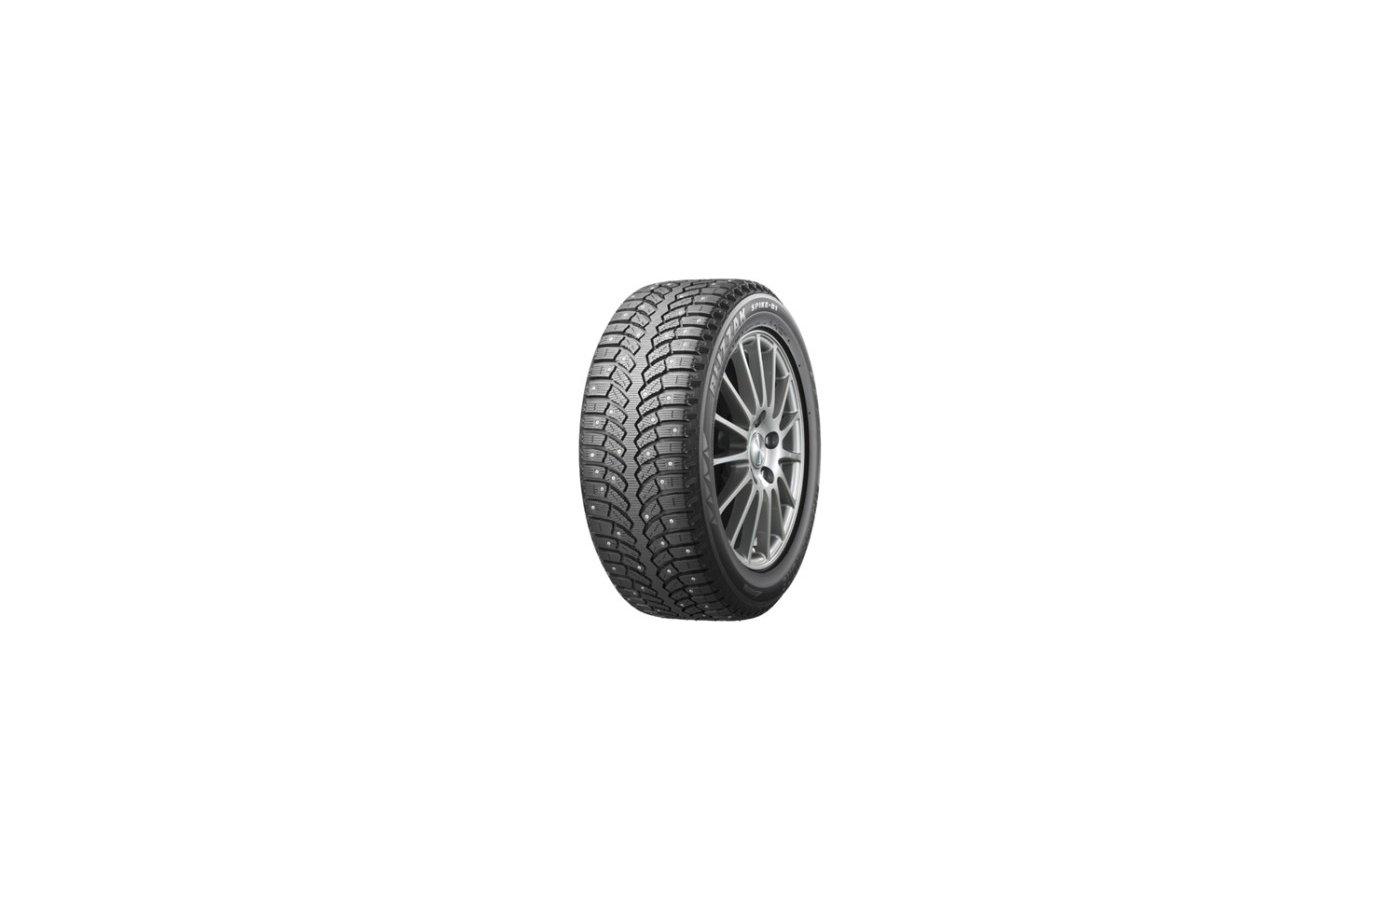 Шина Bridgestone Blizzak Spike-01 215/65 R16 TL 98T шип